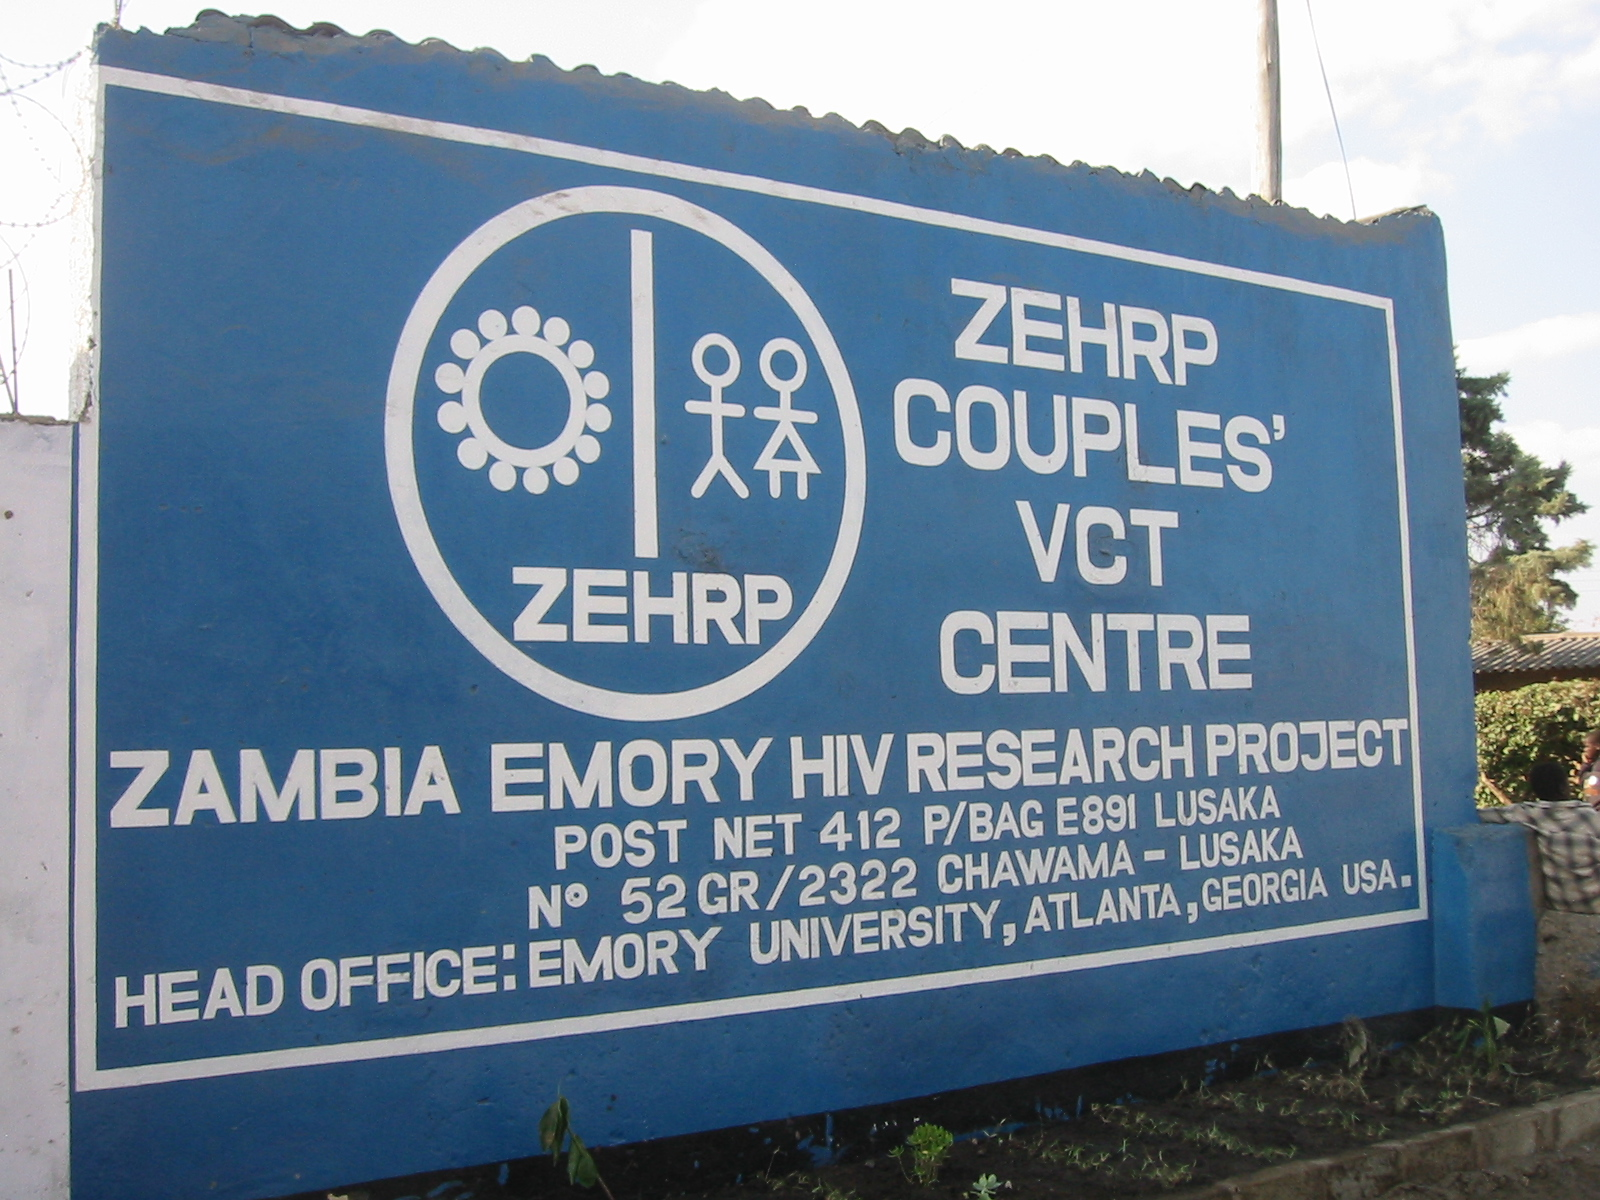 Photo of the Chawama ZEHRP CVCT Center